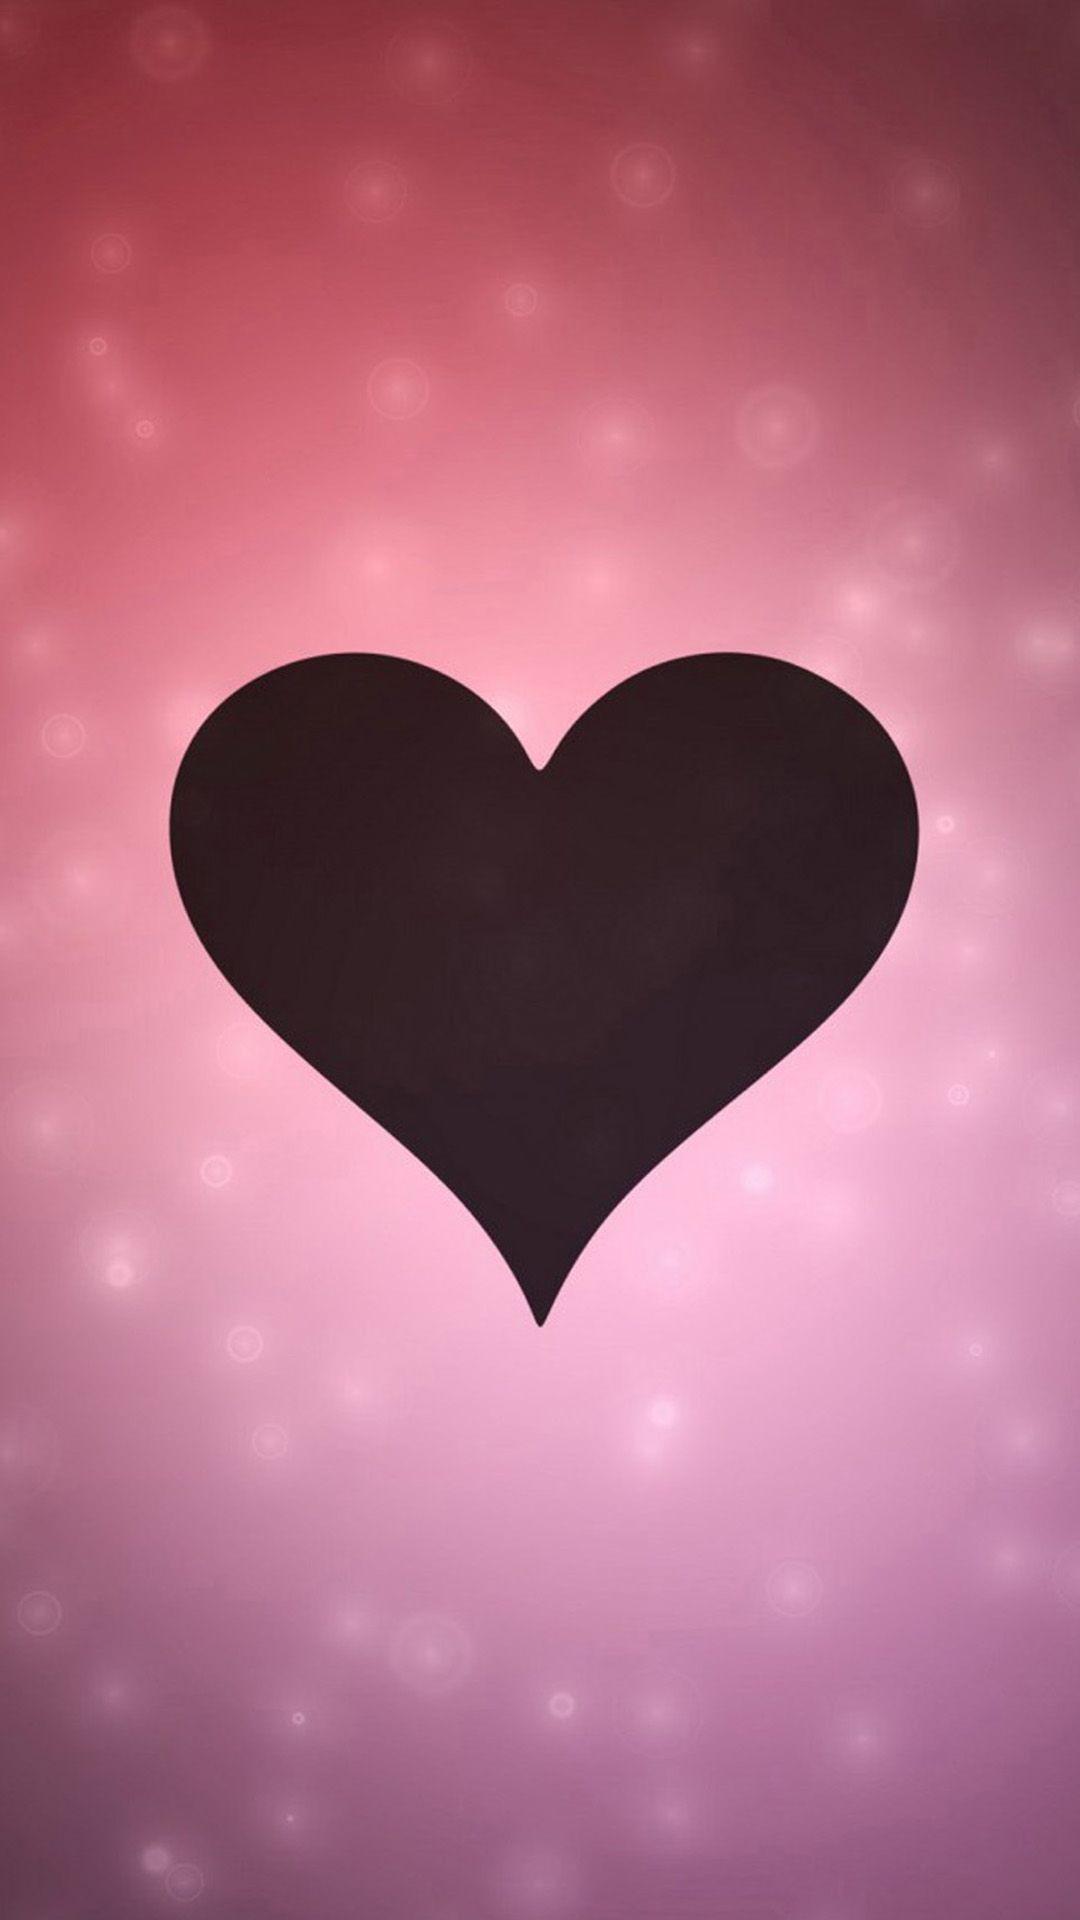 Pin By Vanessa On Lockscreens Valentines Wallpaper Sparkle Wallpaper Heart Wallpaper